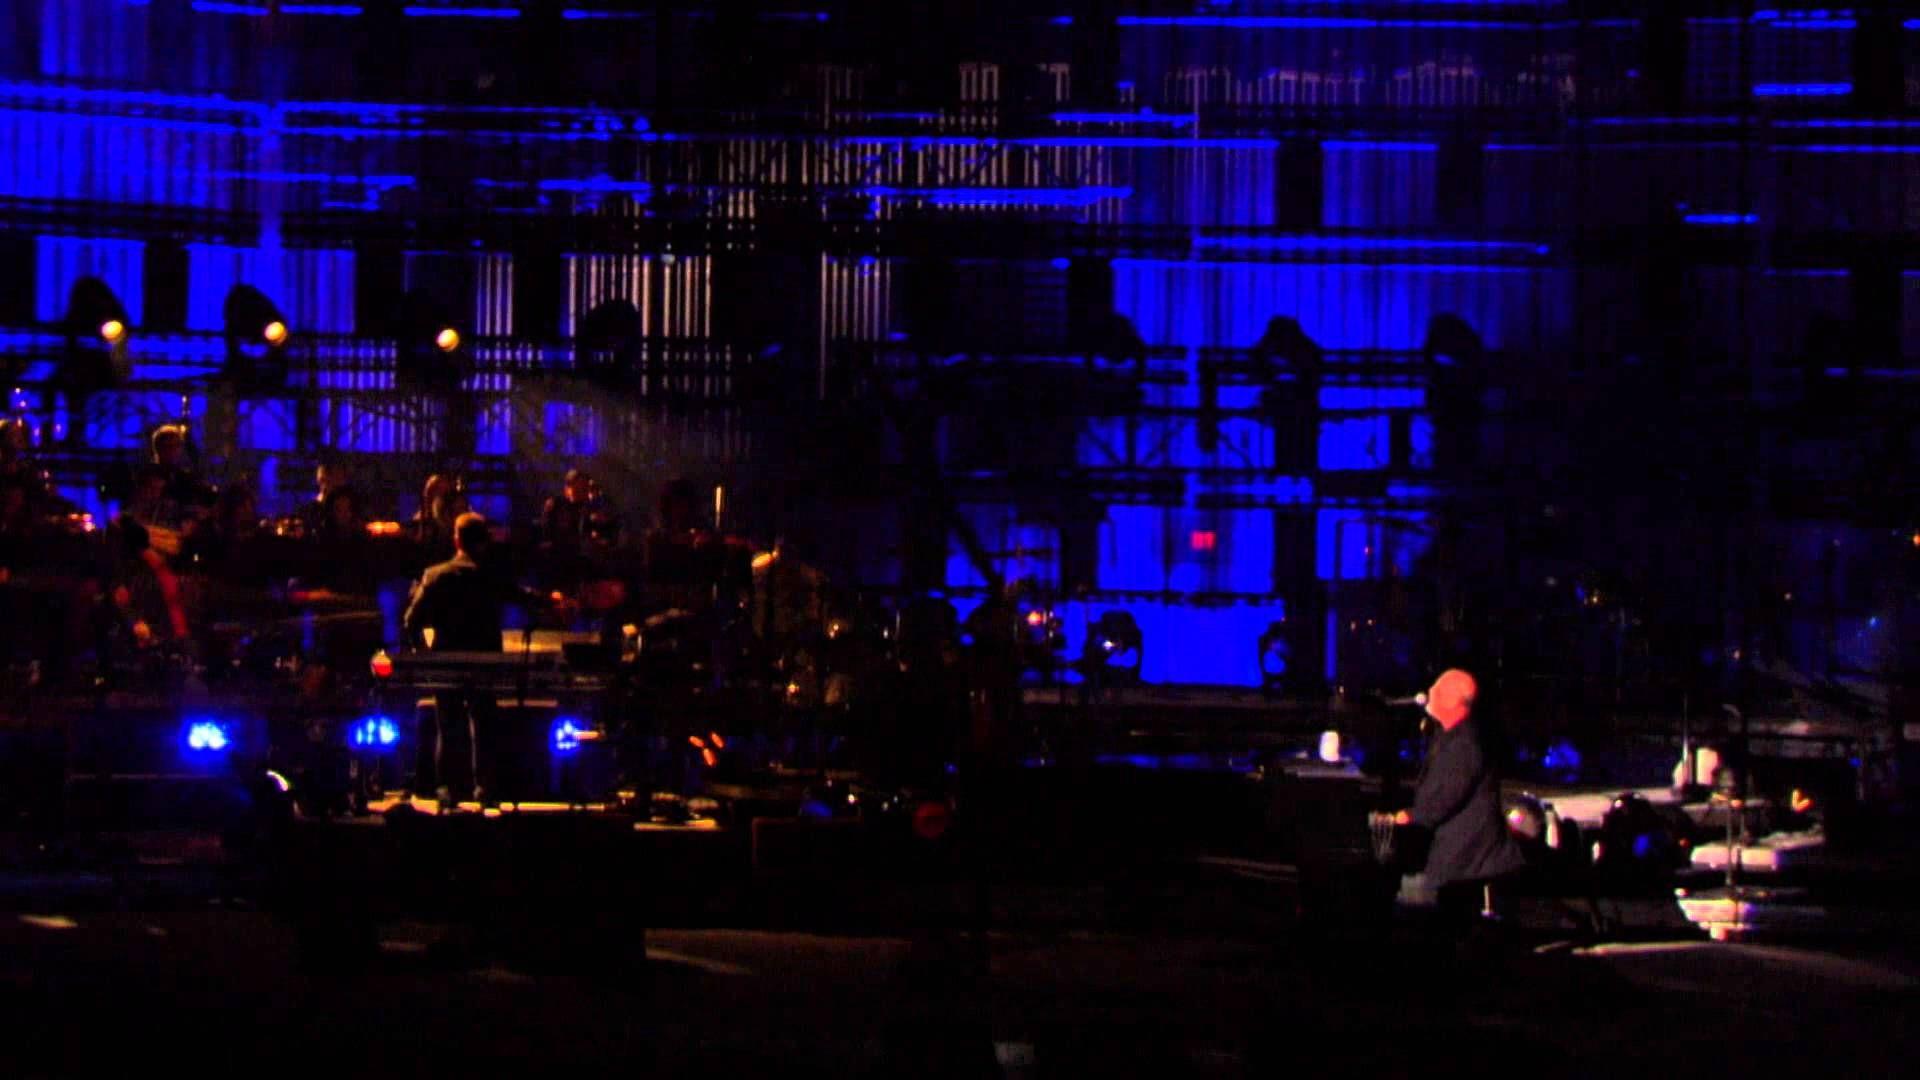 Billy Joel Lullabye Goodnight My Angel Live At Shea Billy Joel Shea Stadium Good Night